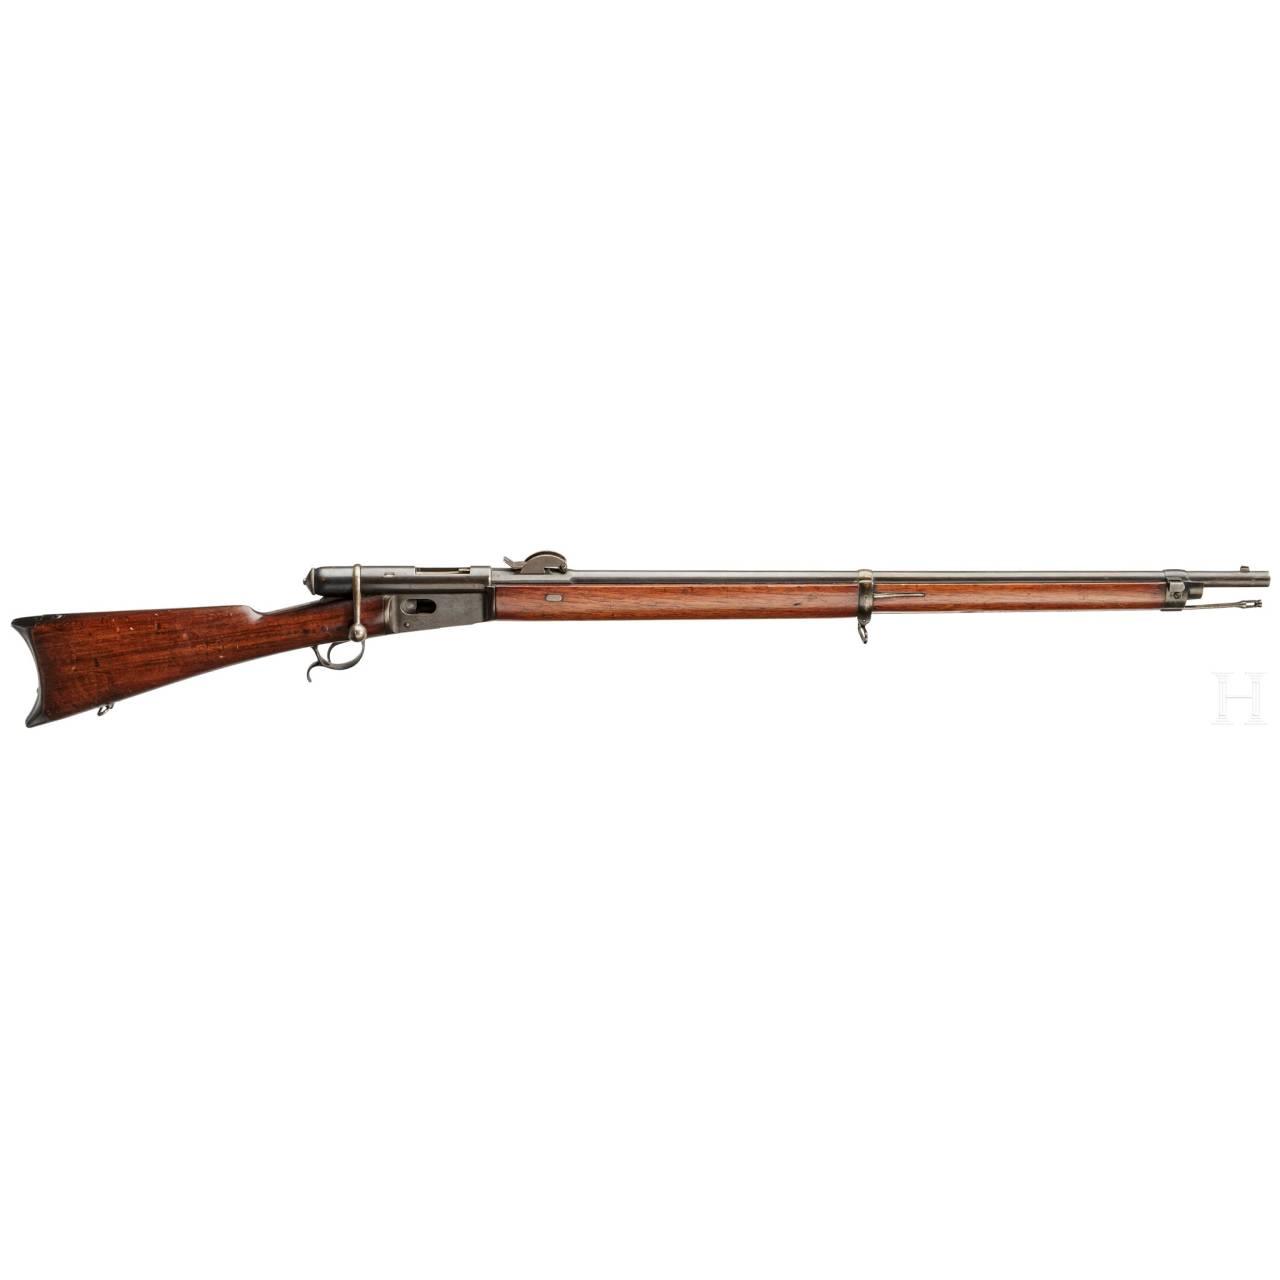 Vetterli M1878, WF Bern